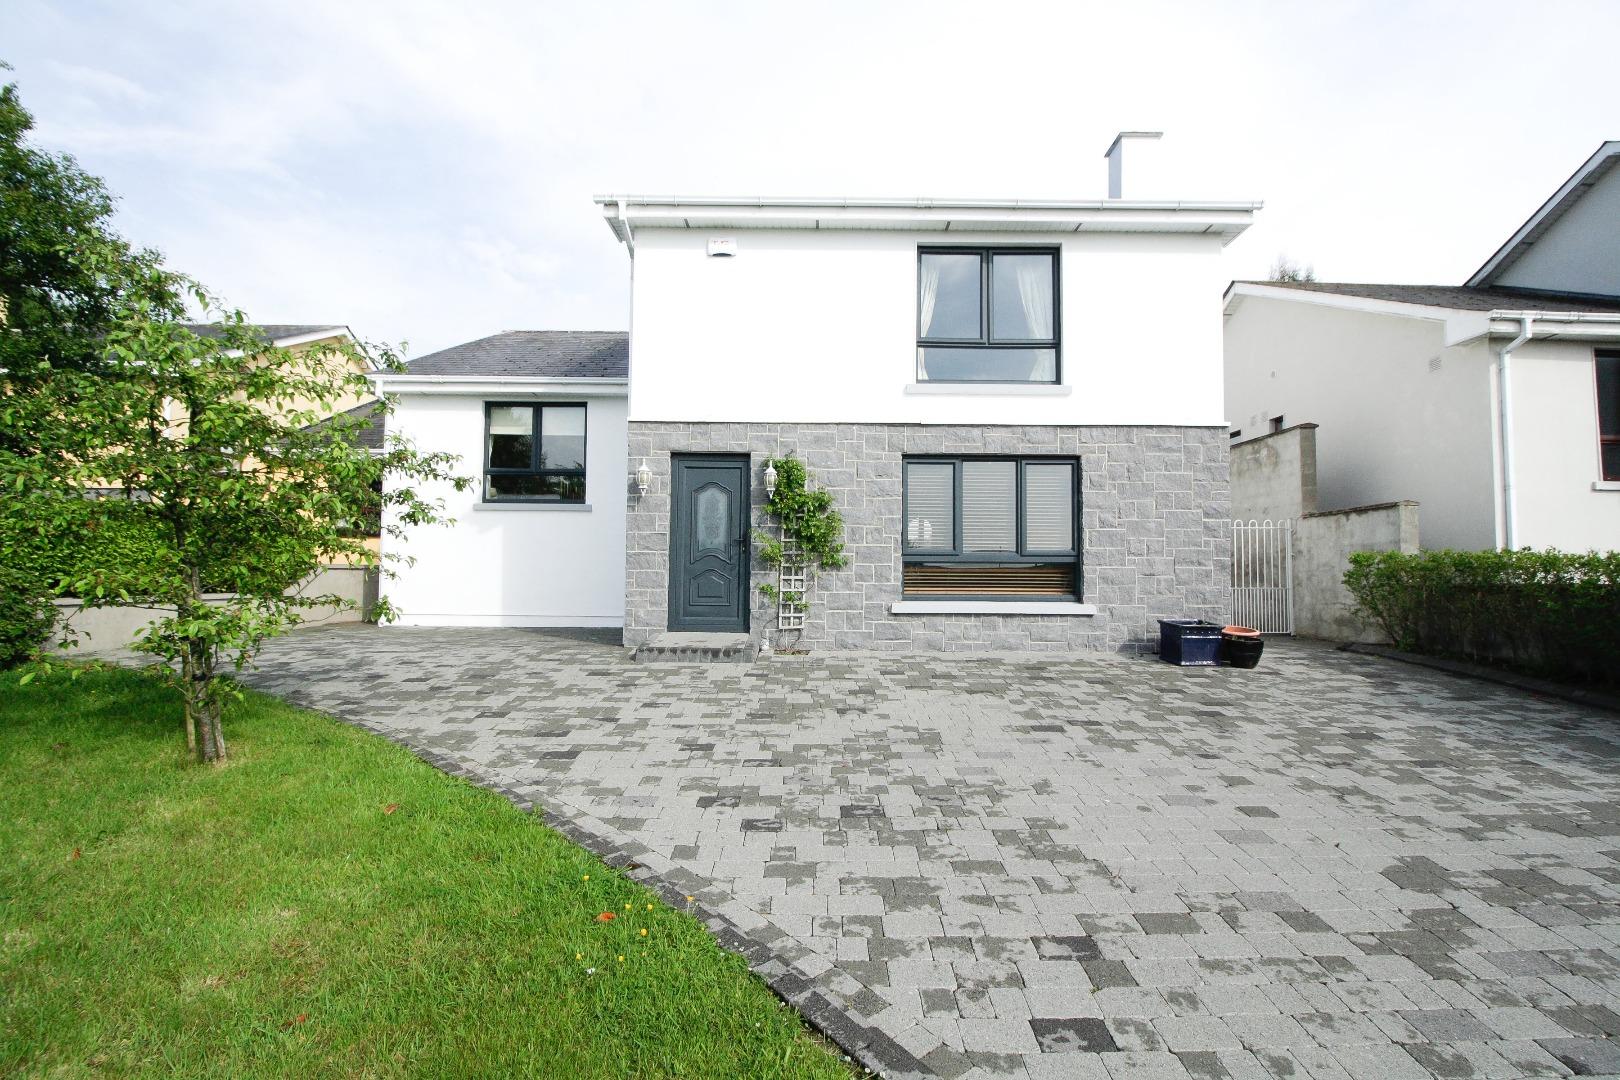 4 bed House for sale on 18 Ledwidge Hall, Slane, Co. Meath - Property Image 1